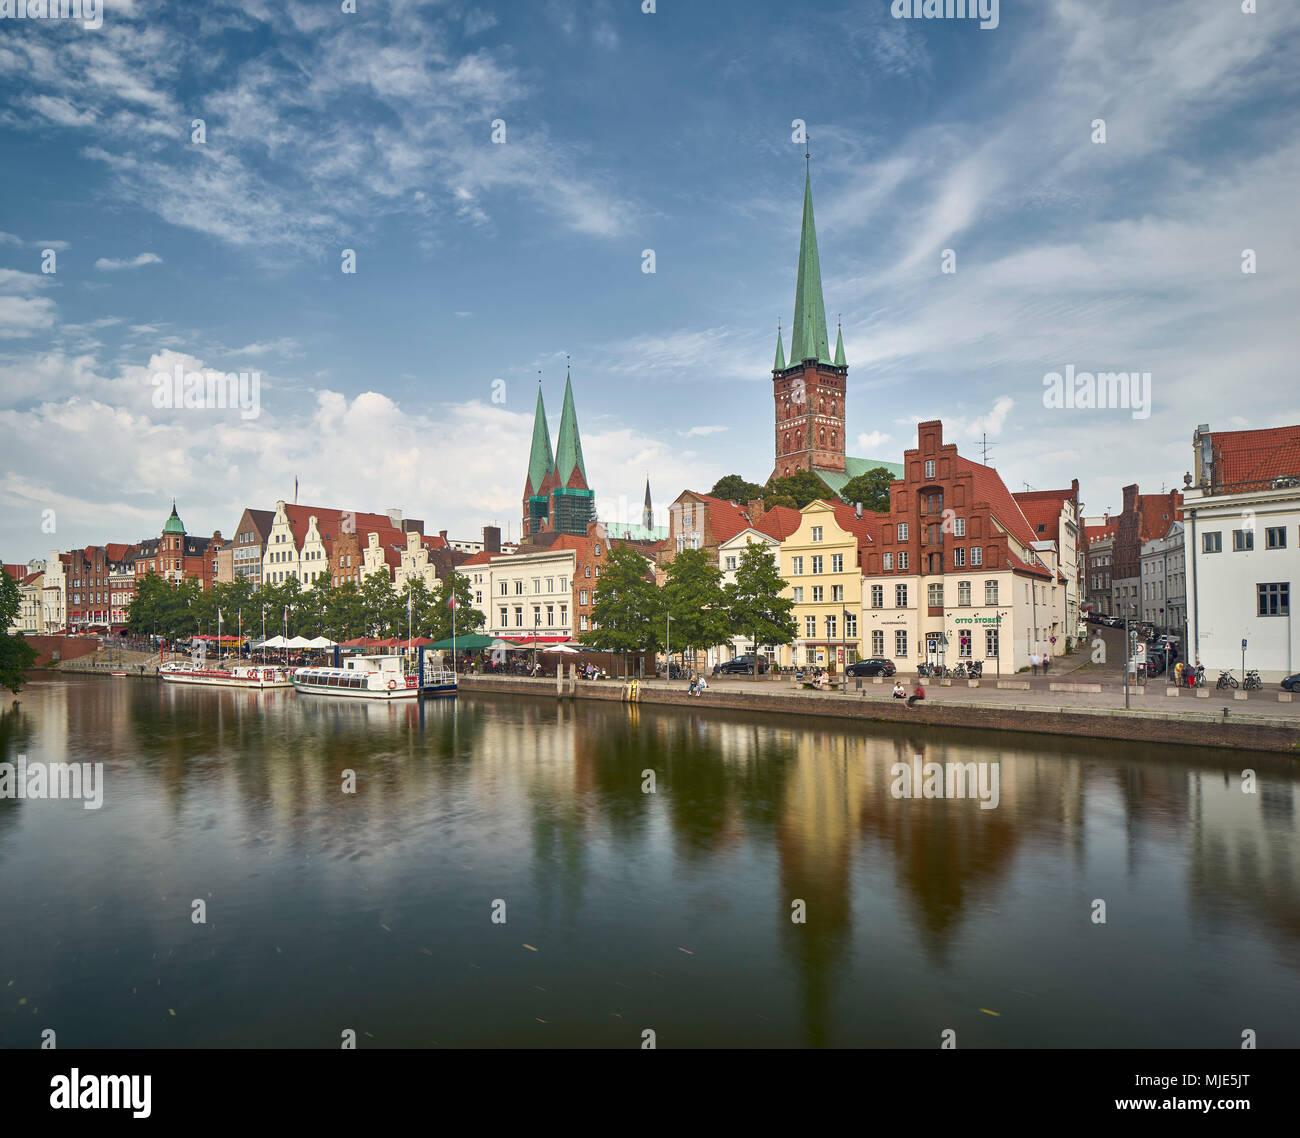 St. Mary's Church, Petrikirche (church), Trave, Lübeck, Schleswig - Holstein, Germany - Stock Image